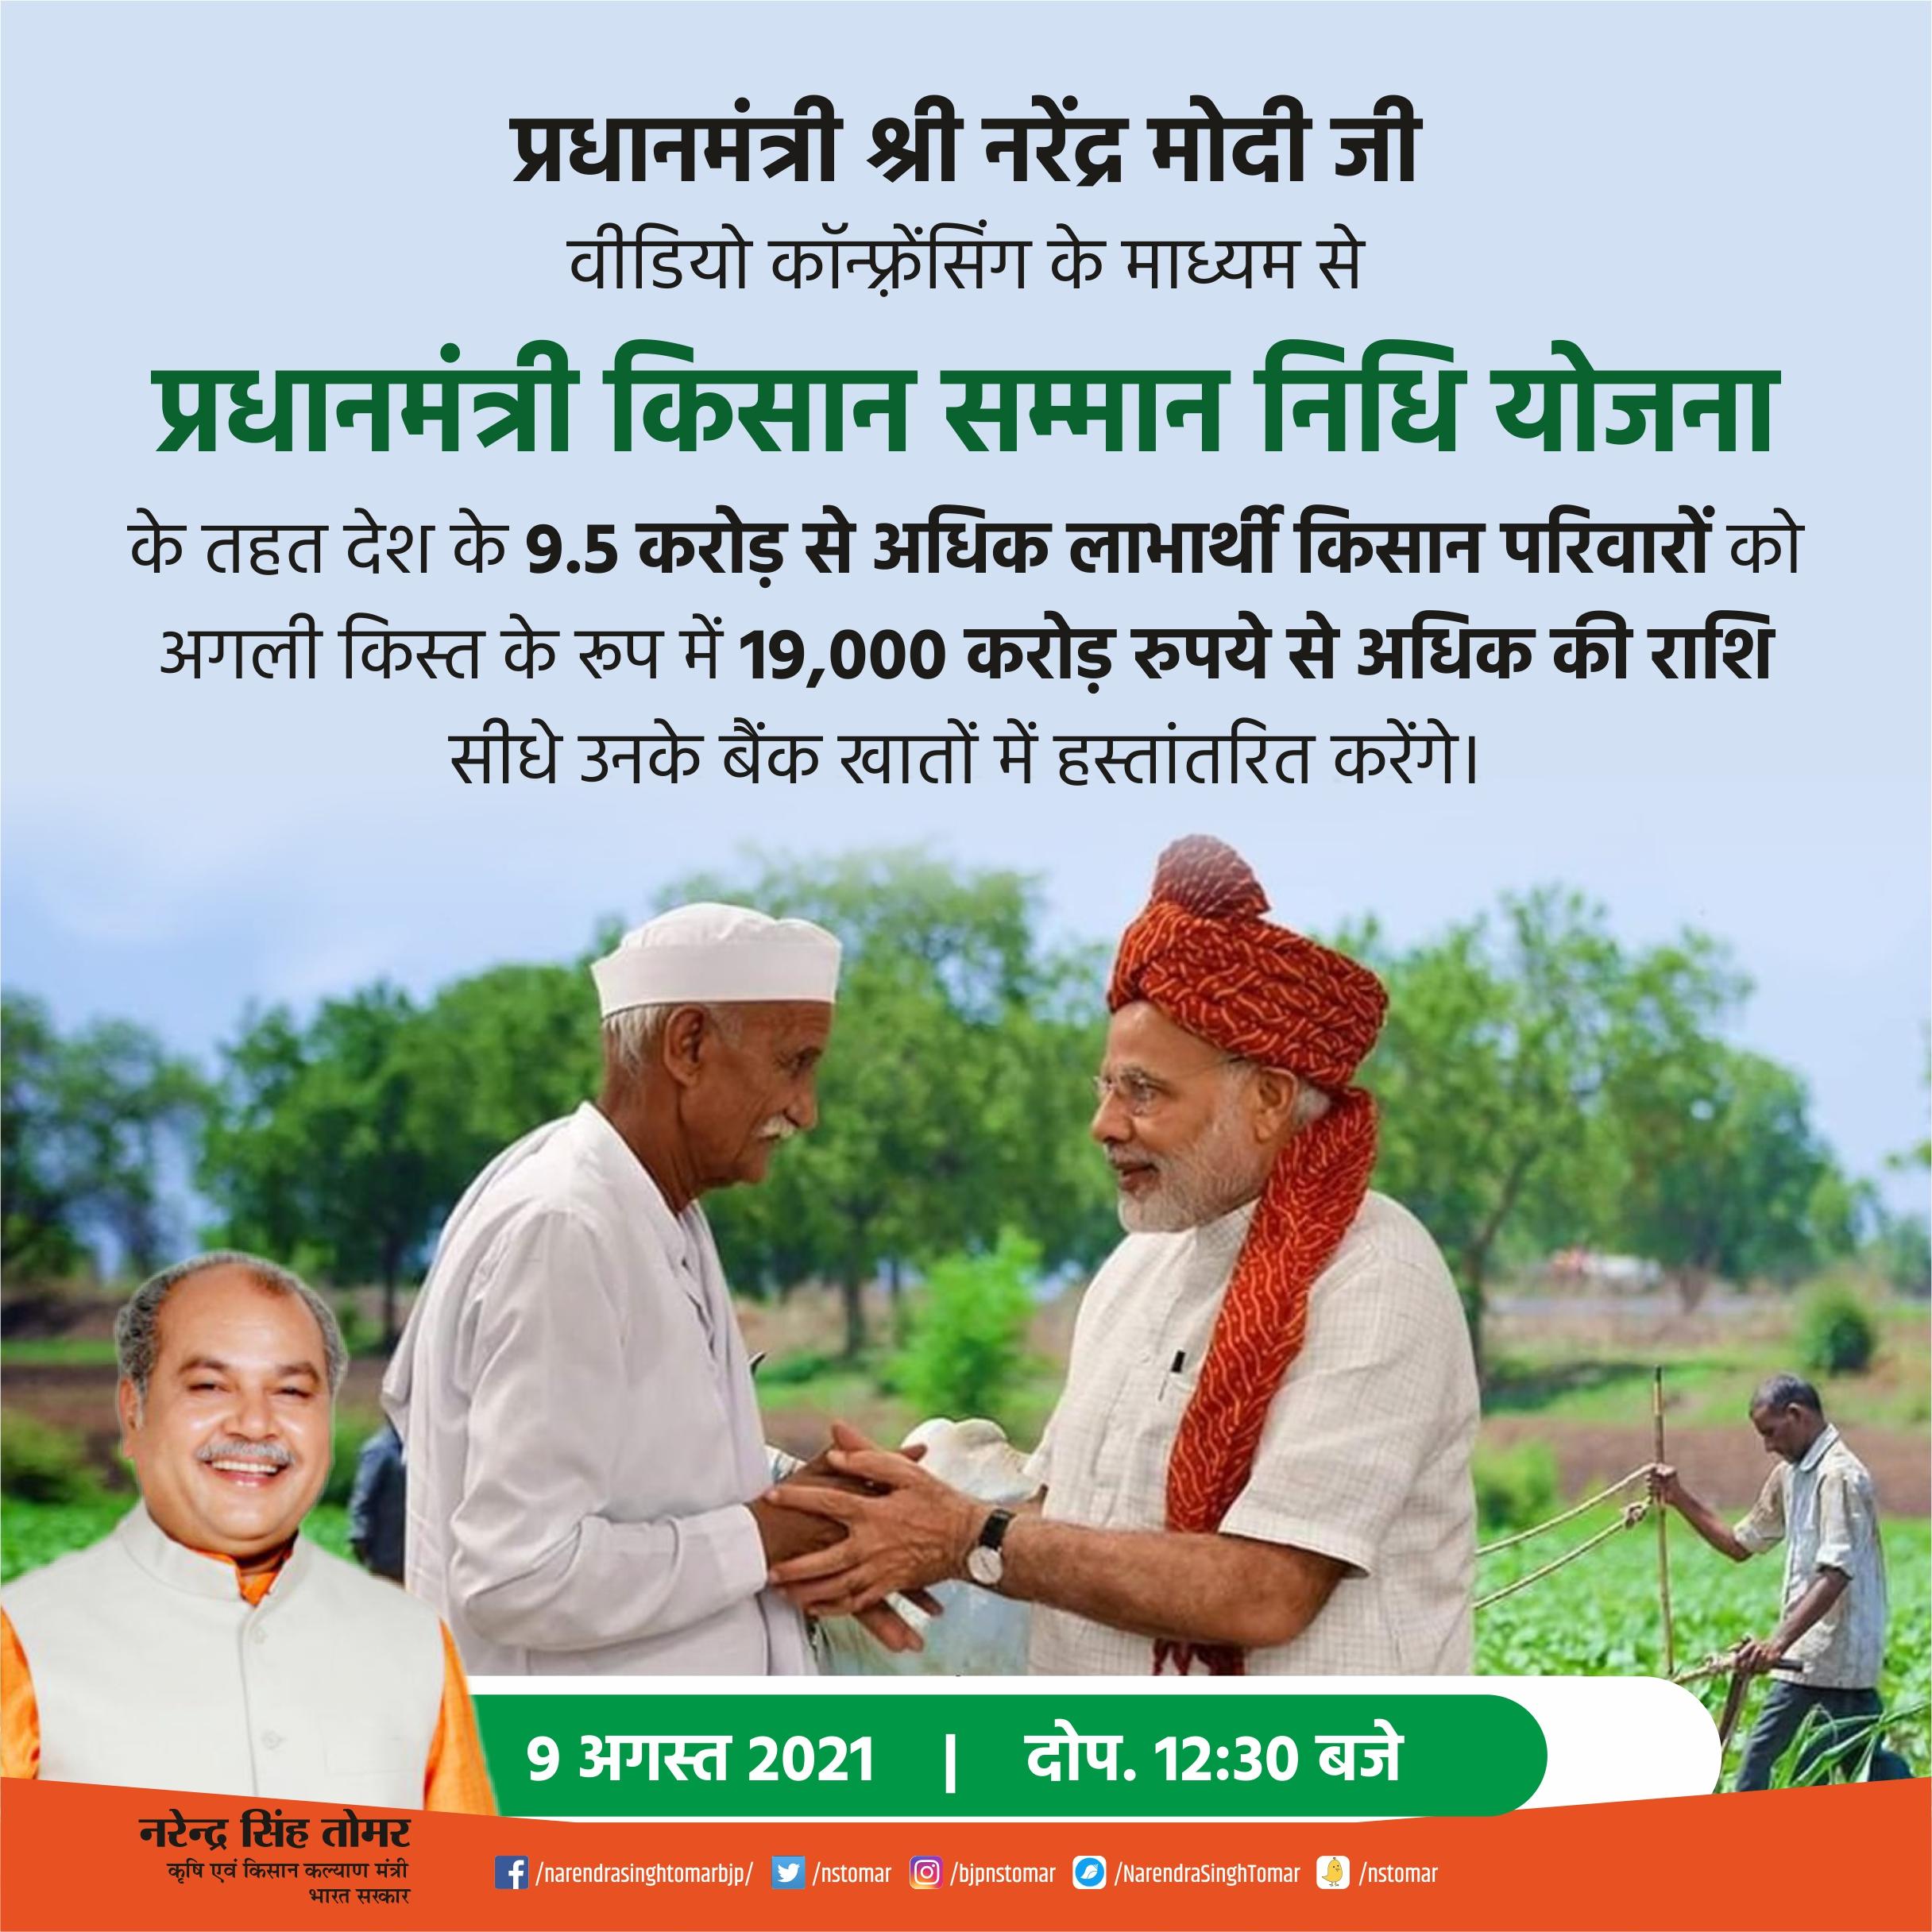 प्रधानमंत्री नरेन्द्र मोदी कल पीएम-किसान योजना के तहत वित्तीय लाभ की अगली किस्त जारी करेंगे